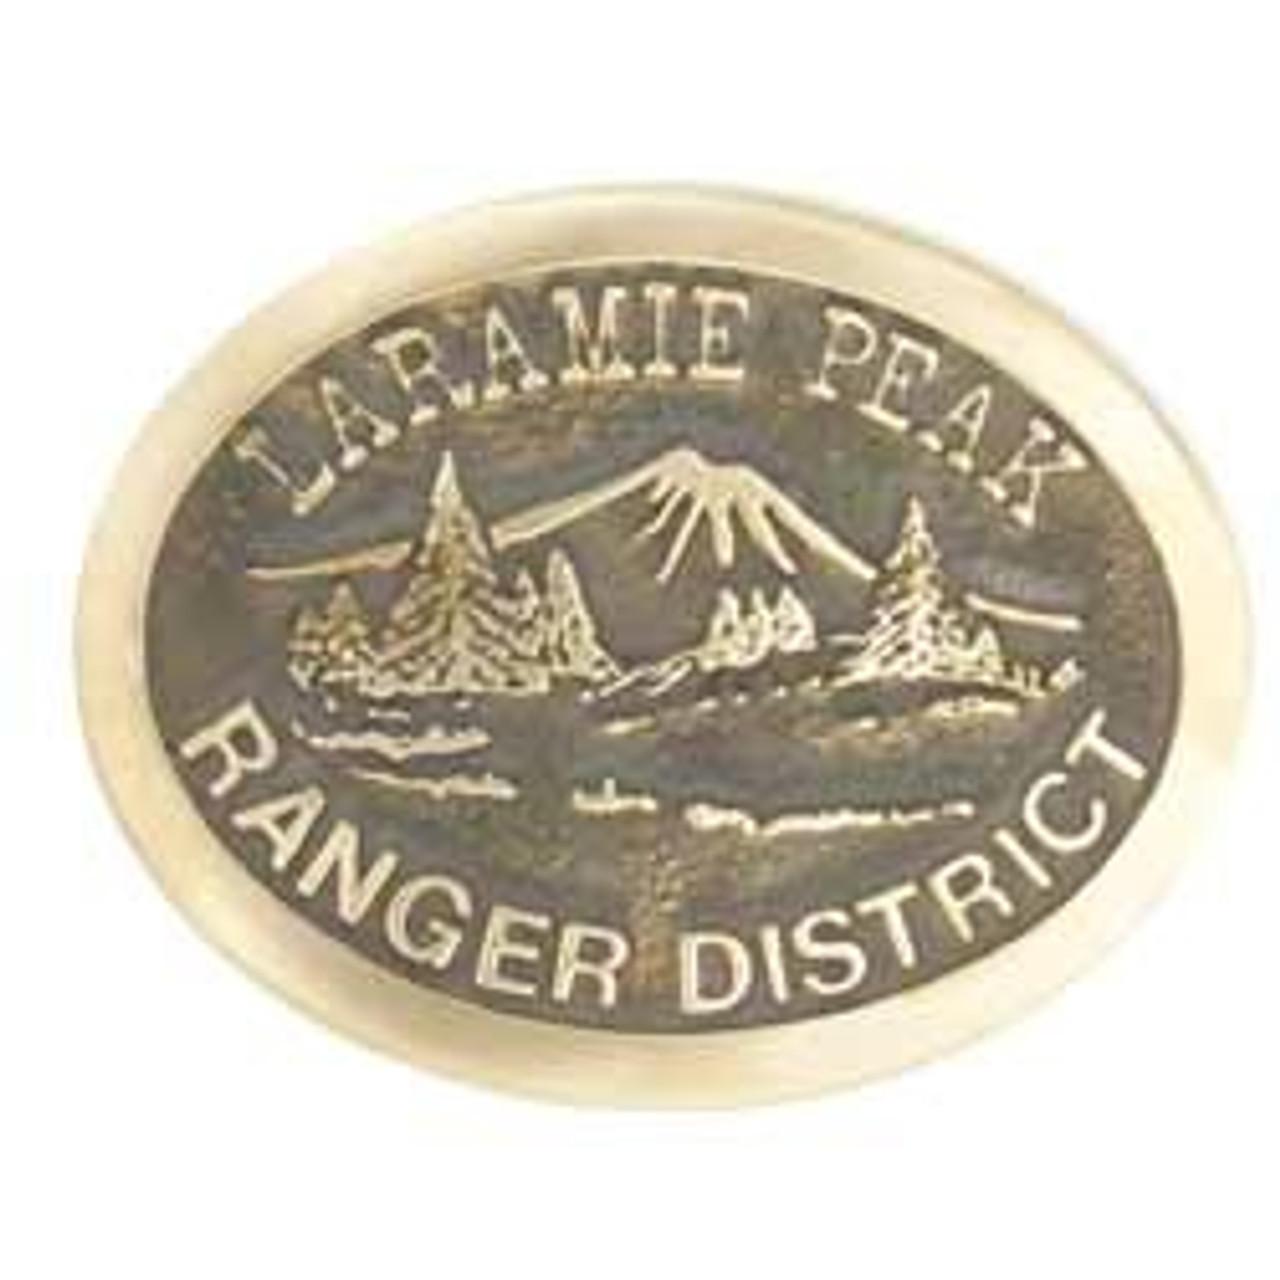 Laramie Peak Ranger District Buckle